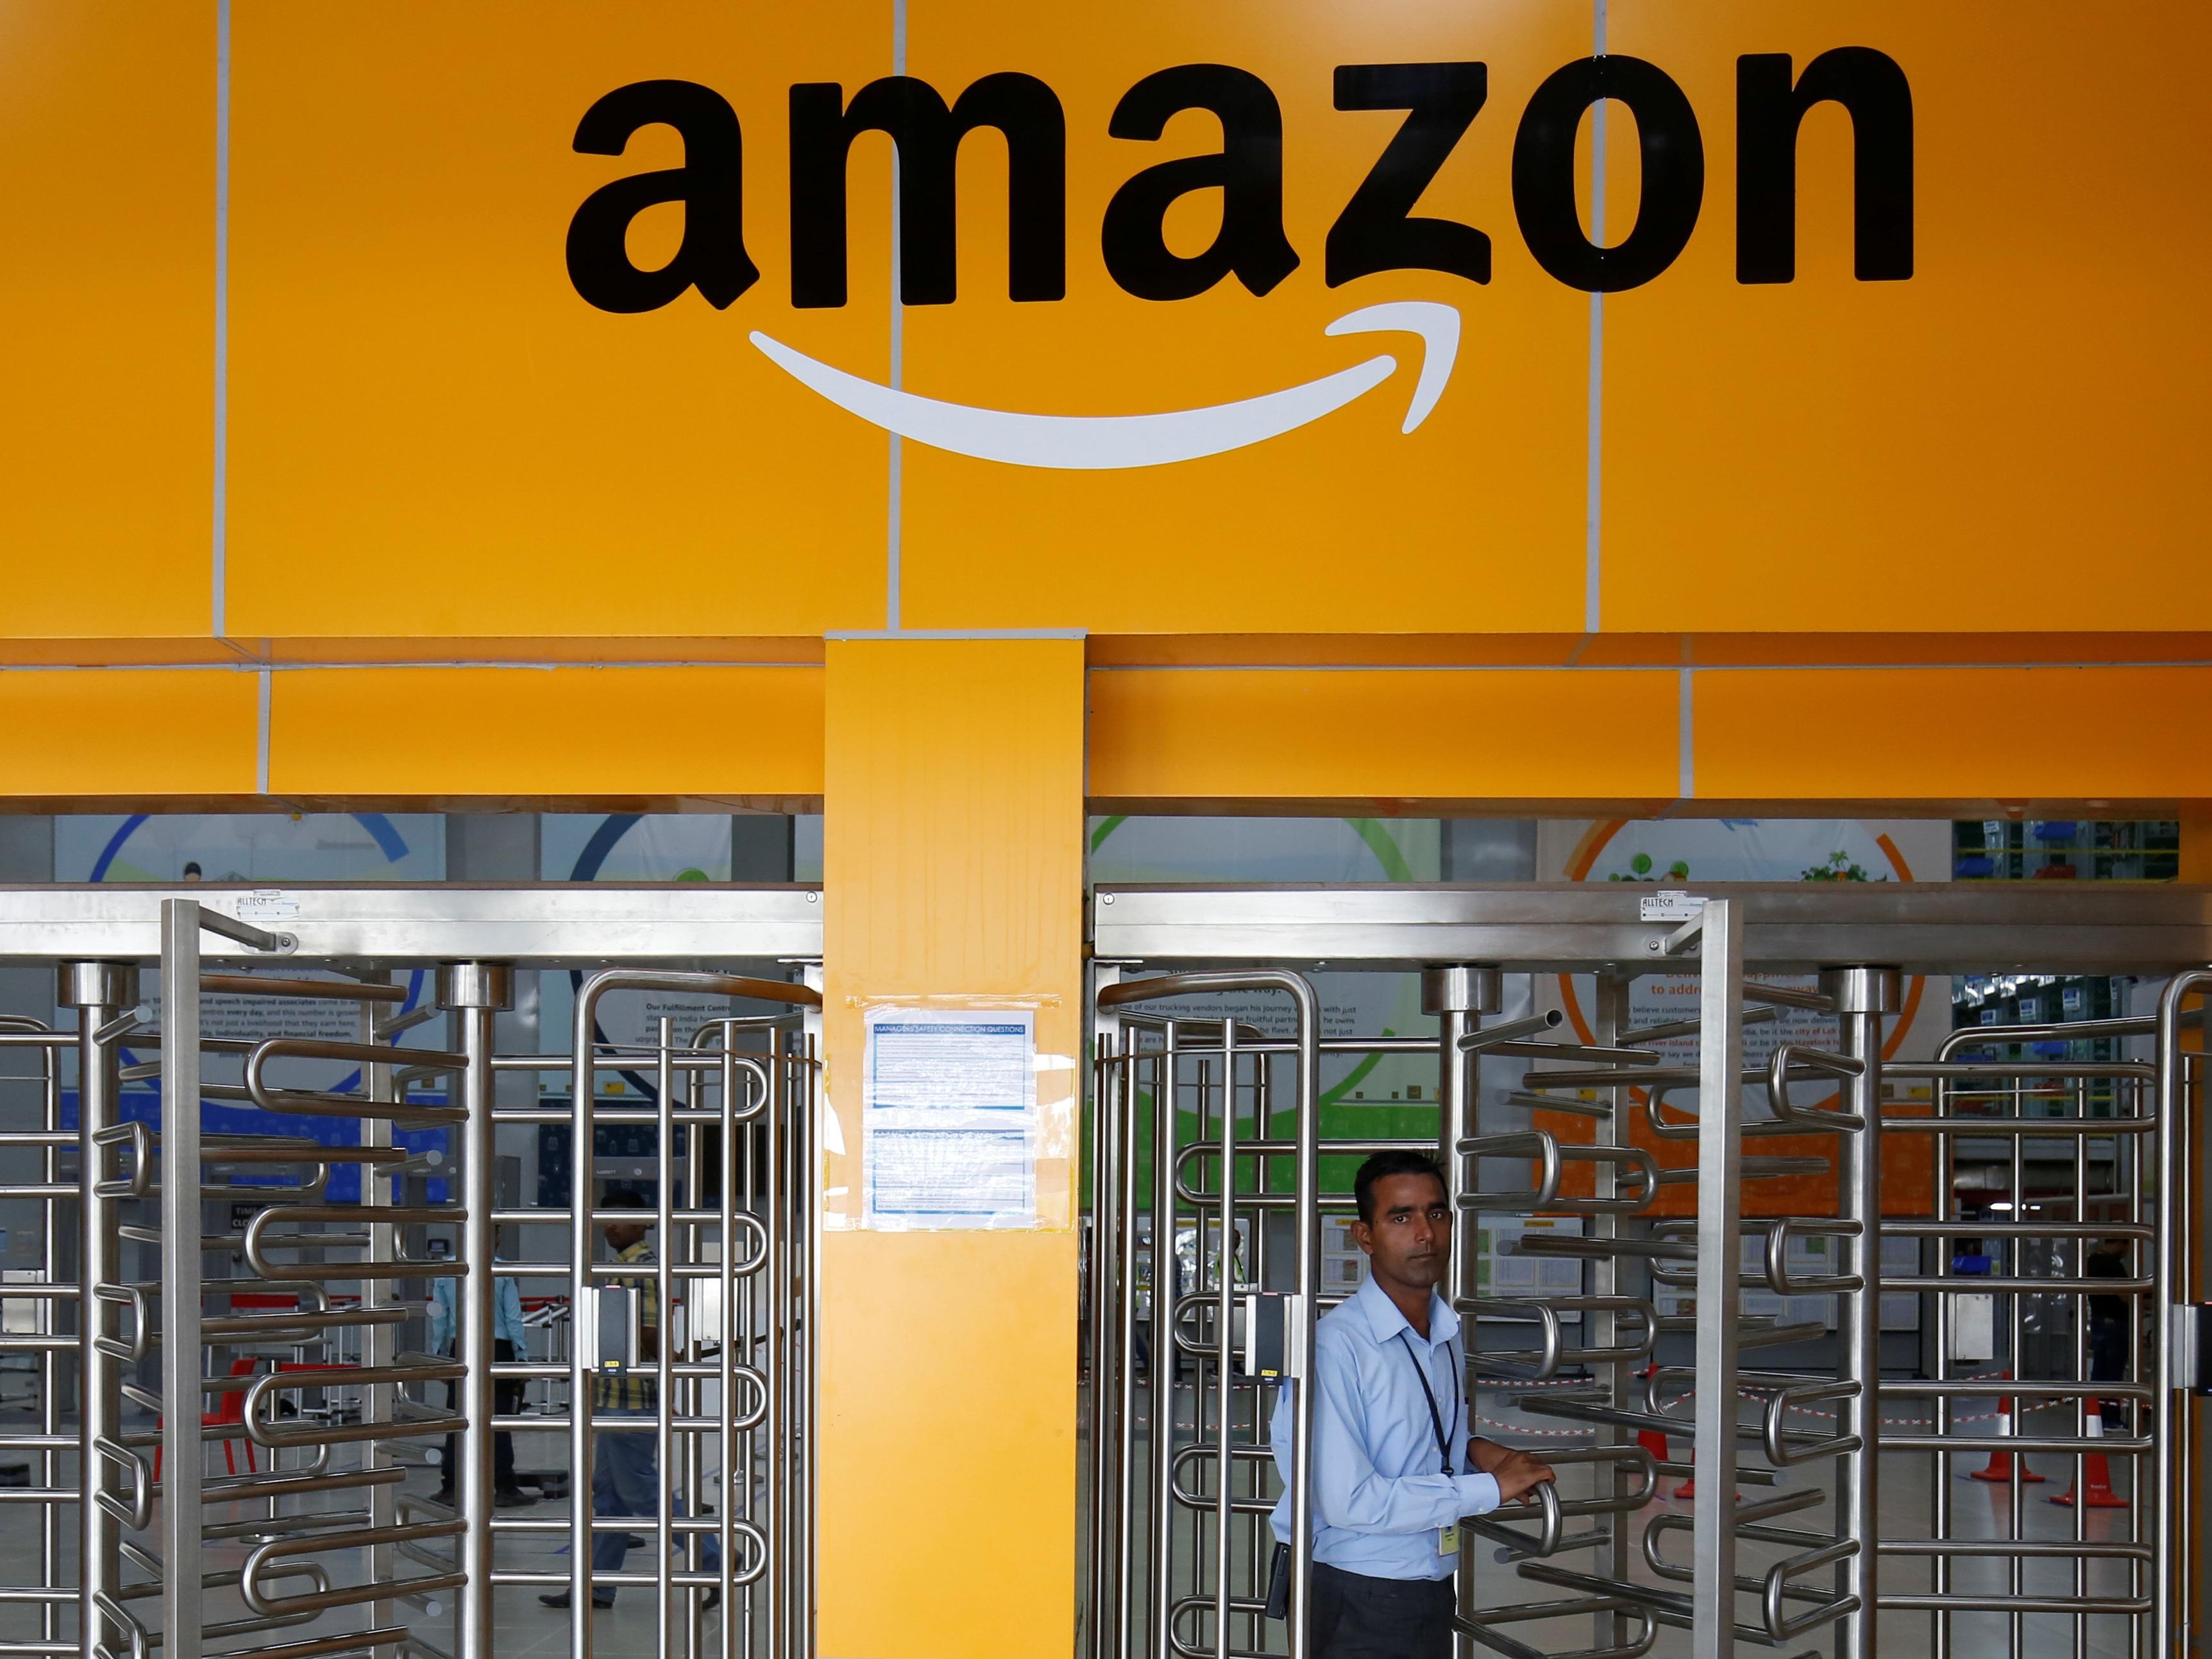 Amazon, Samara Said to Buy India's 'More' Retail Chain for $580 Million